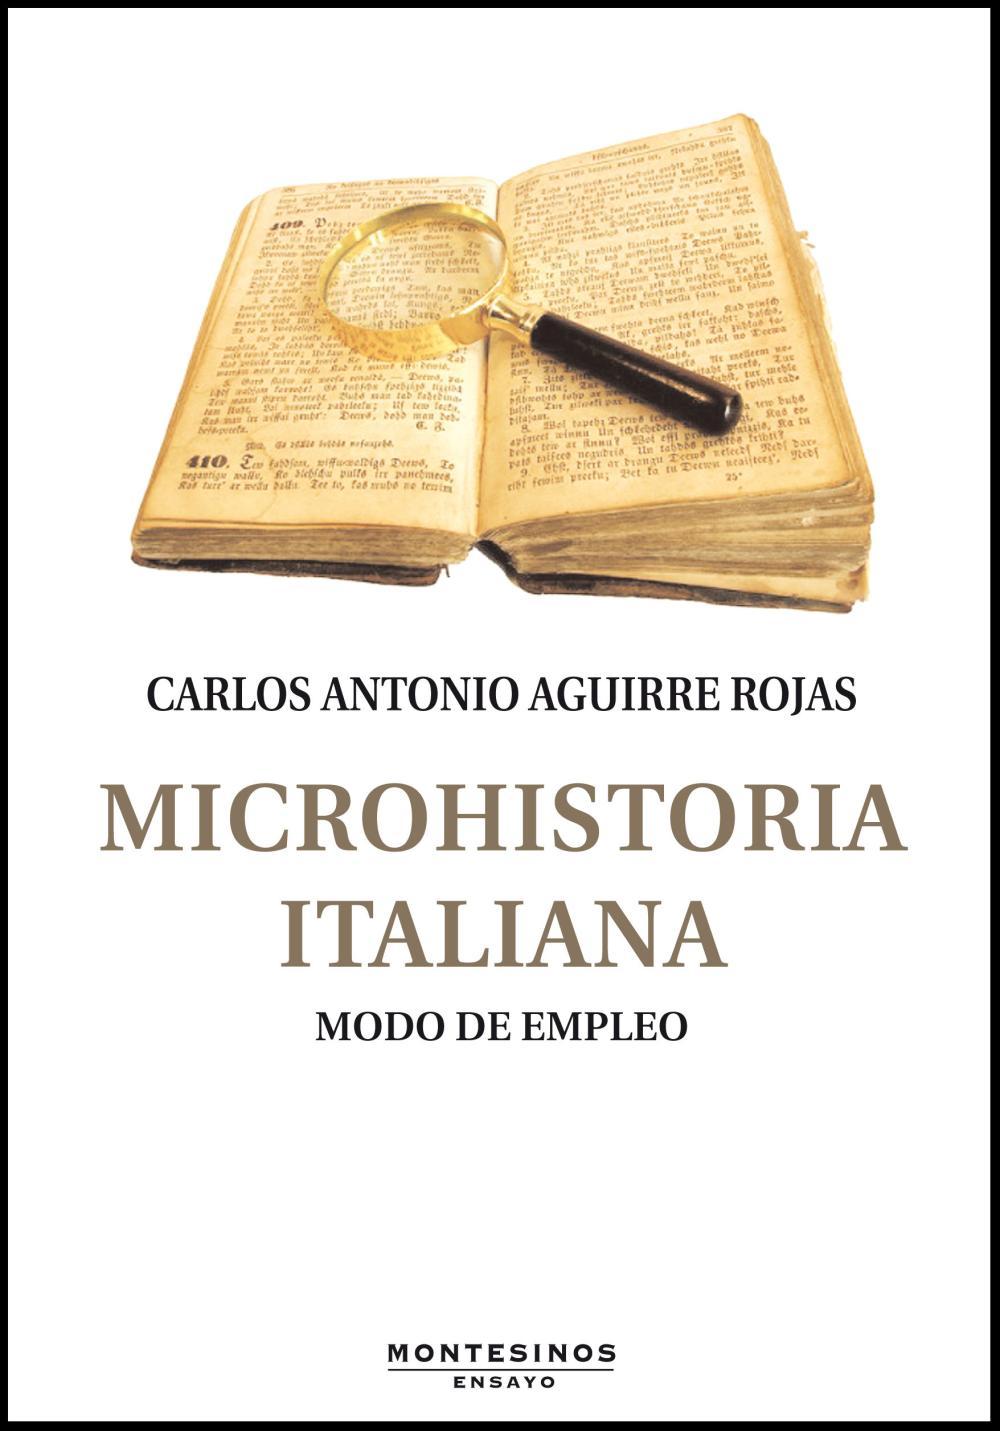 Microhistoria italiana